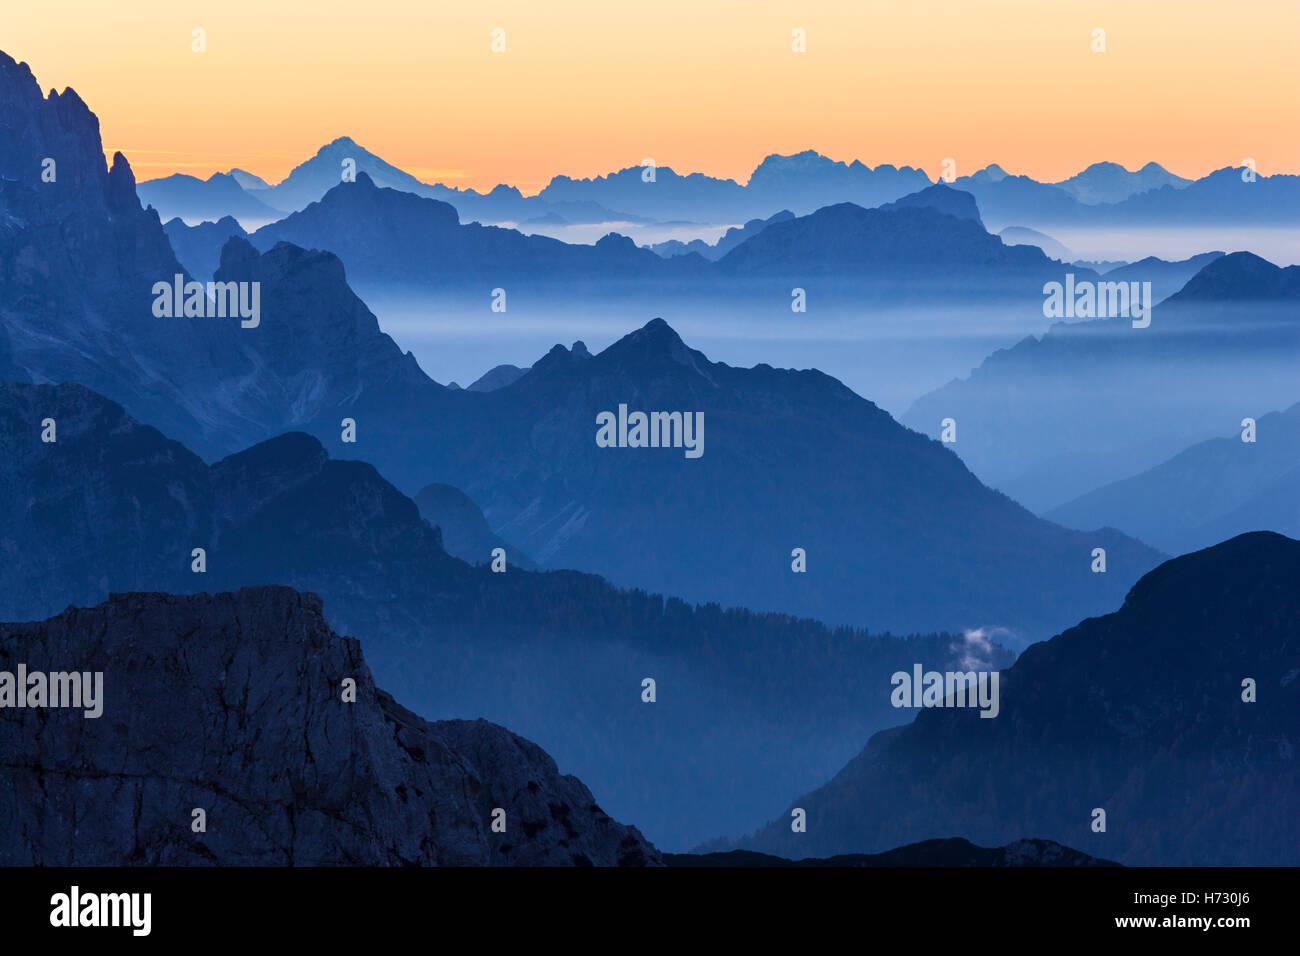 Mountain peaks background - Stock Image